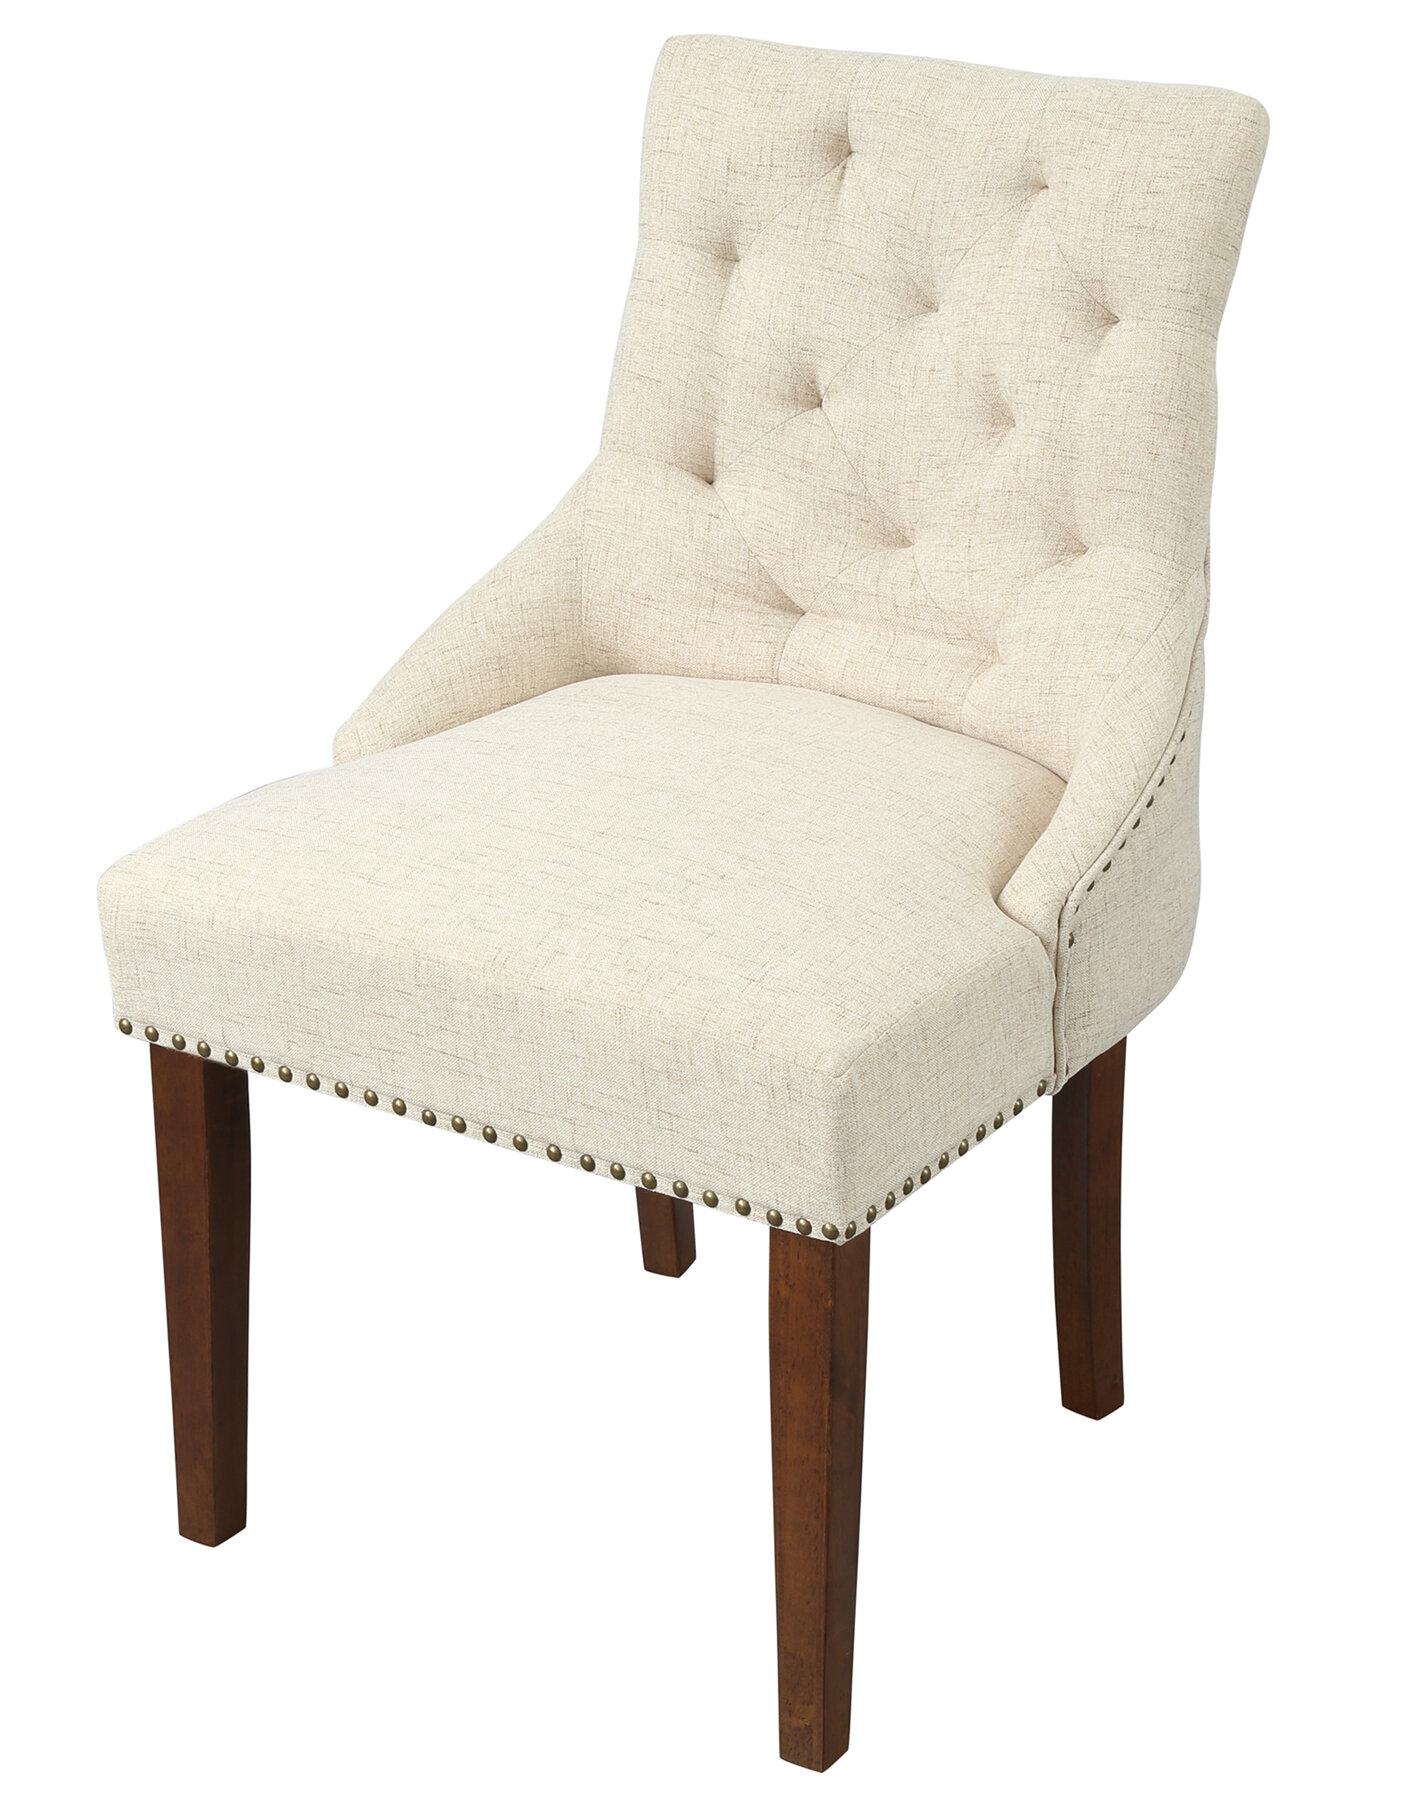 Ophelia Co Hammondville Tufted Linen Upholstered Dining Chair Wayfair